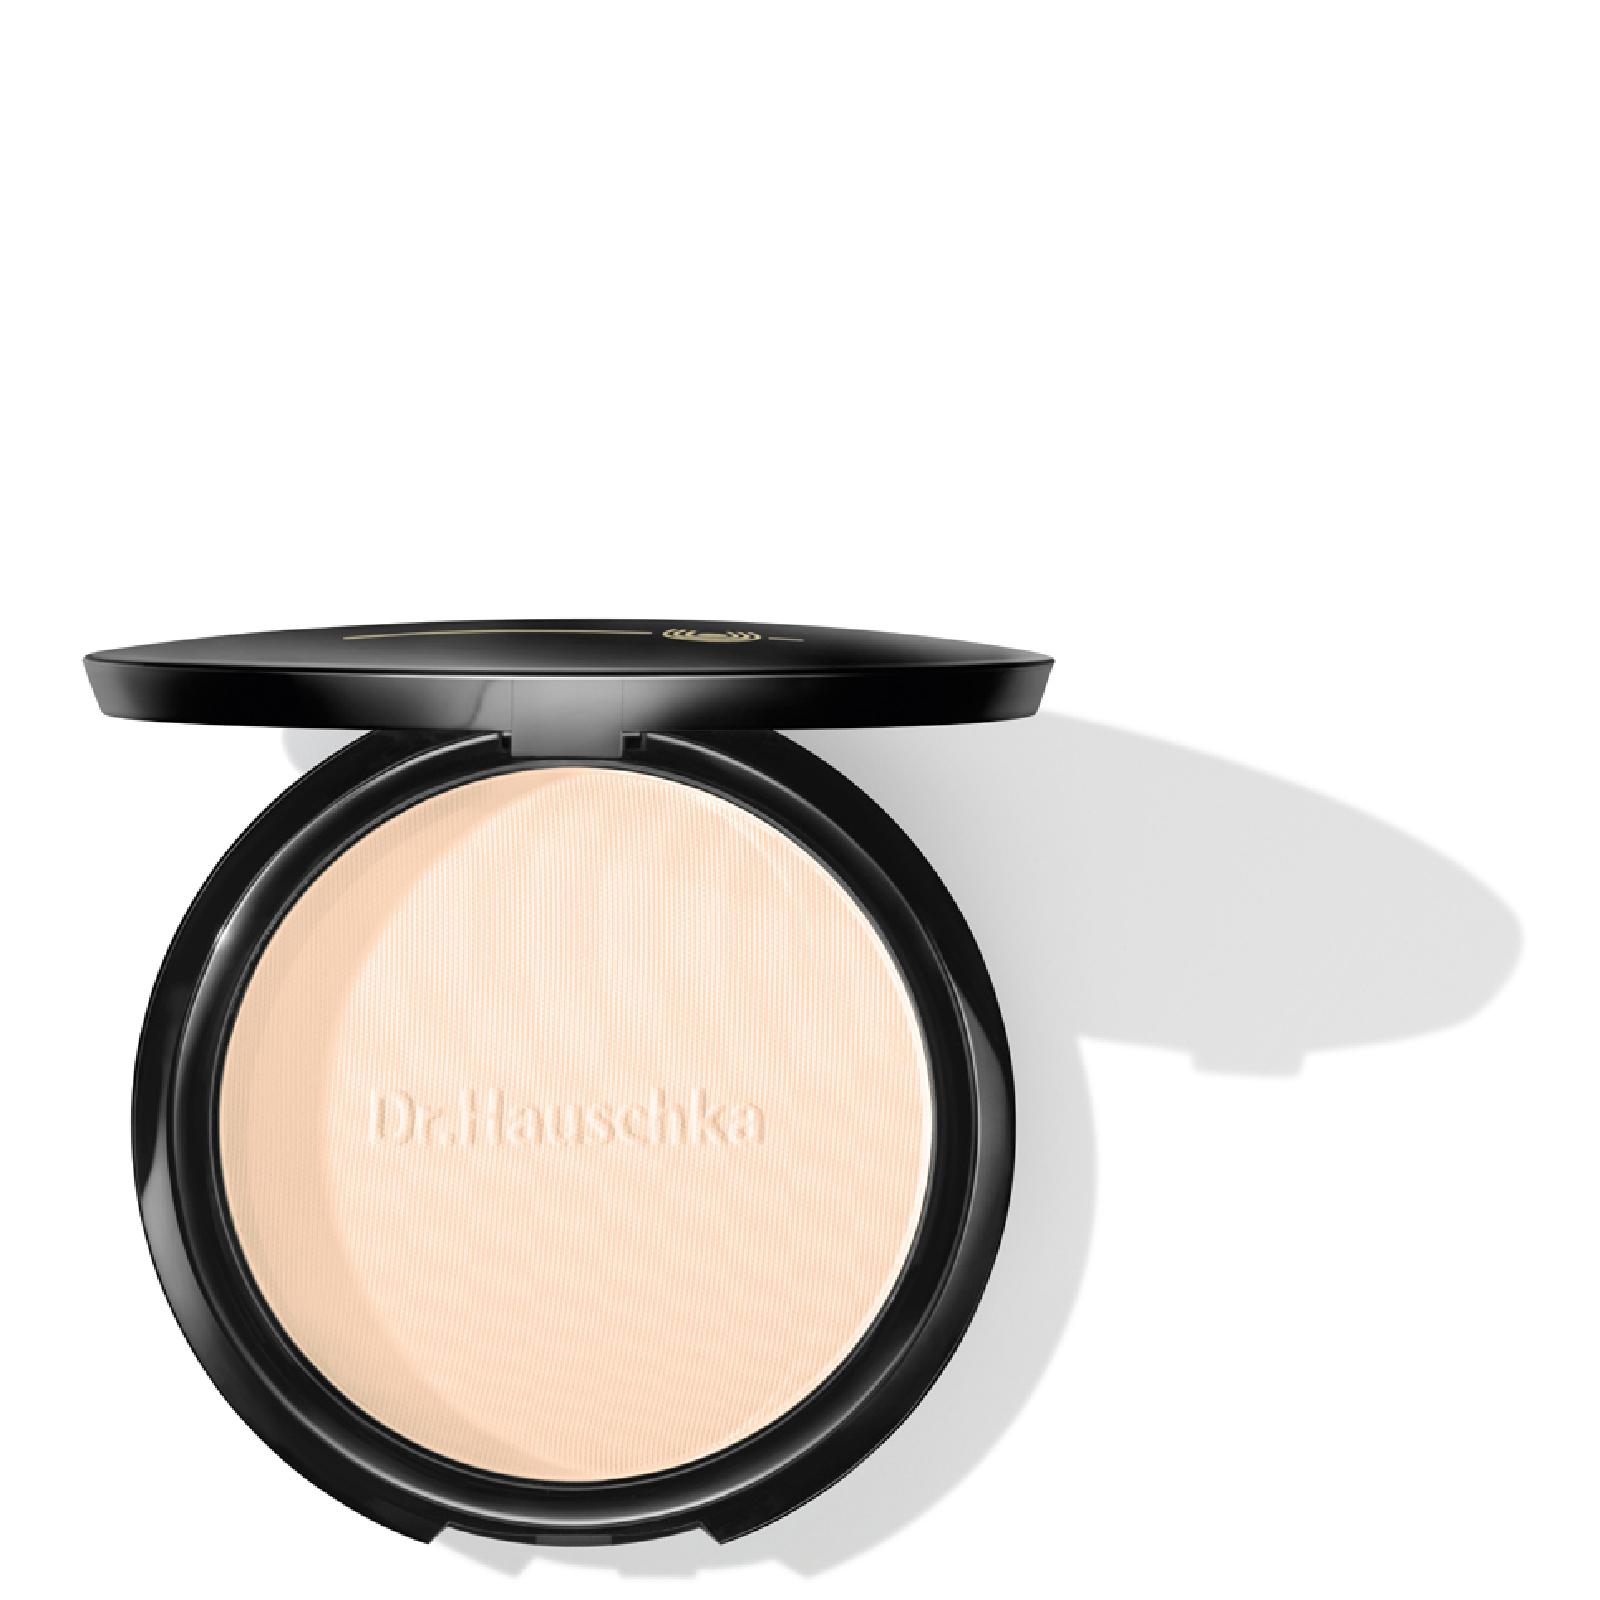 Dr. Hauschka Face Powder Compact (9g)